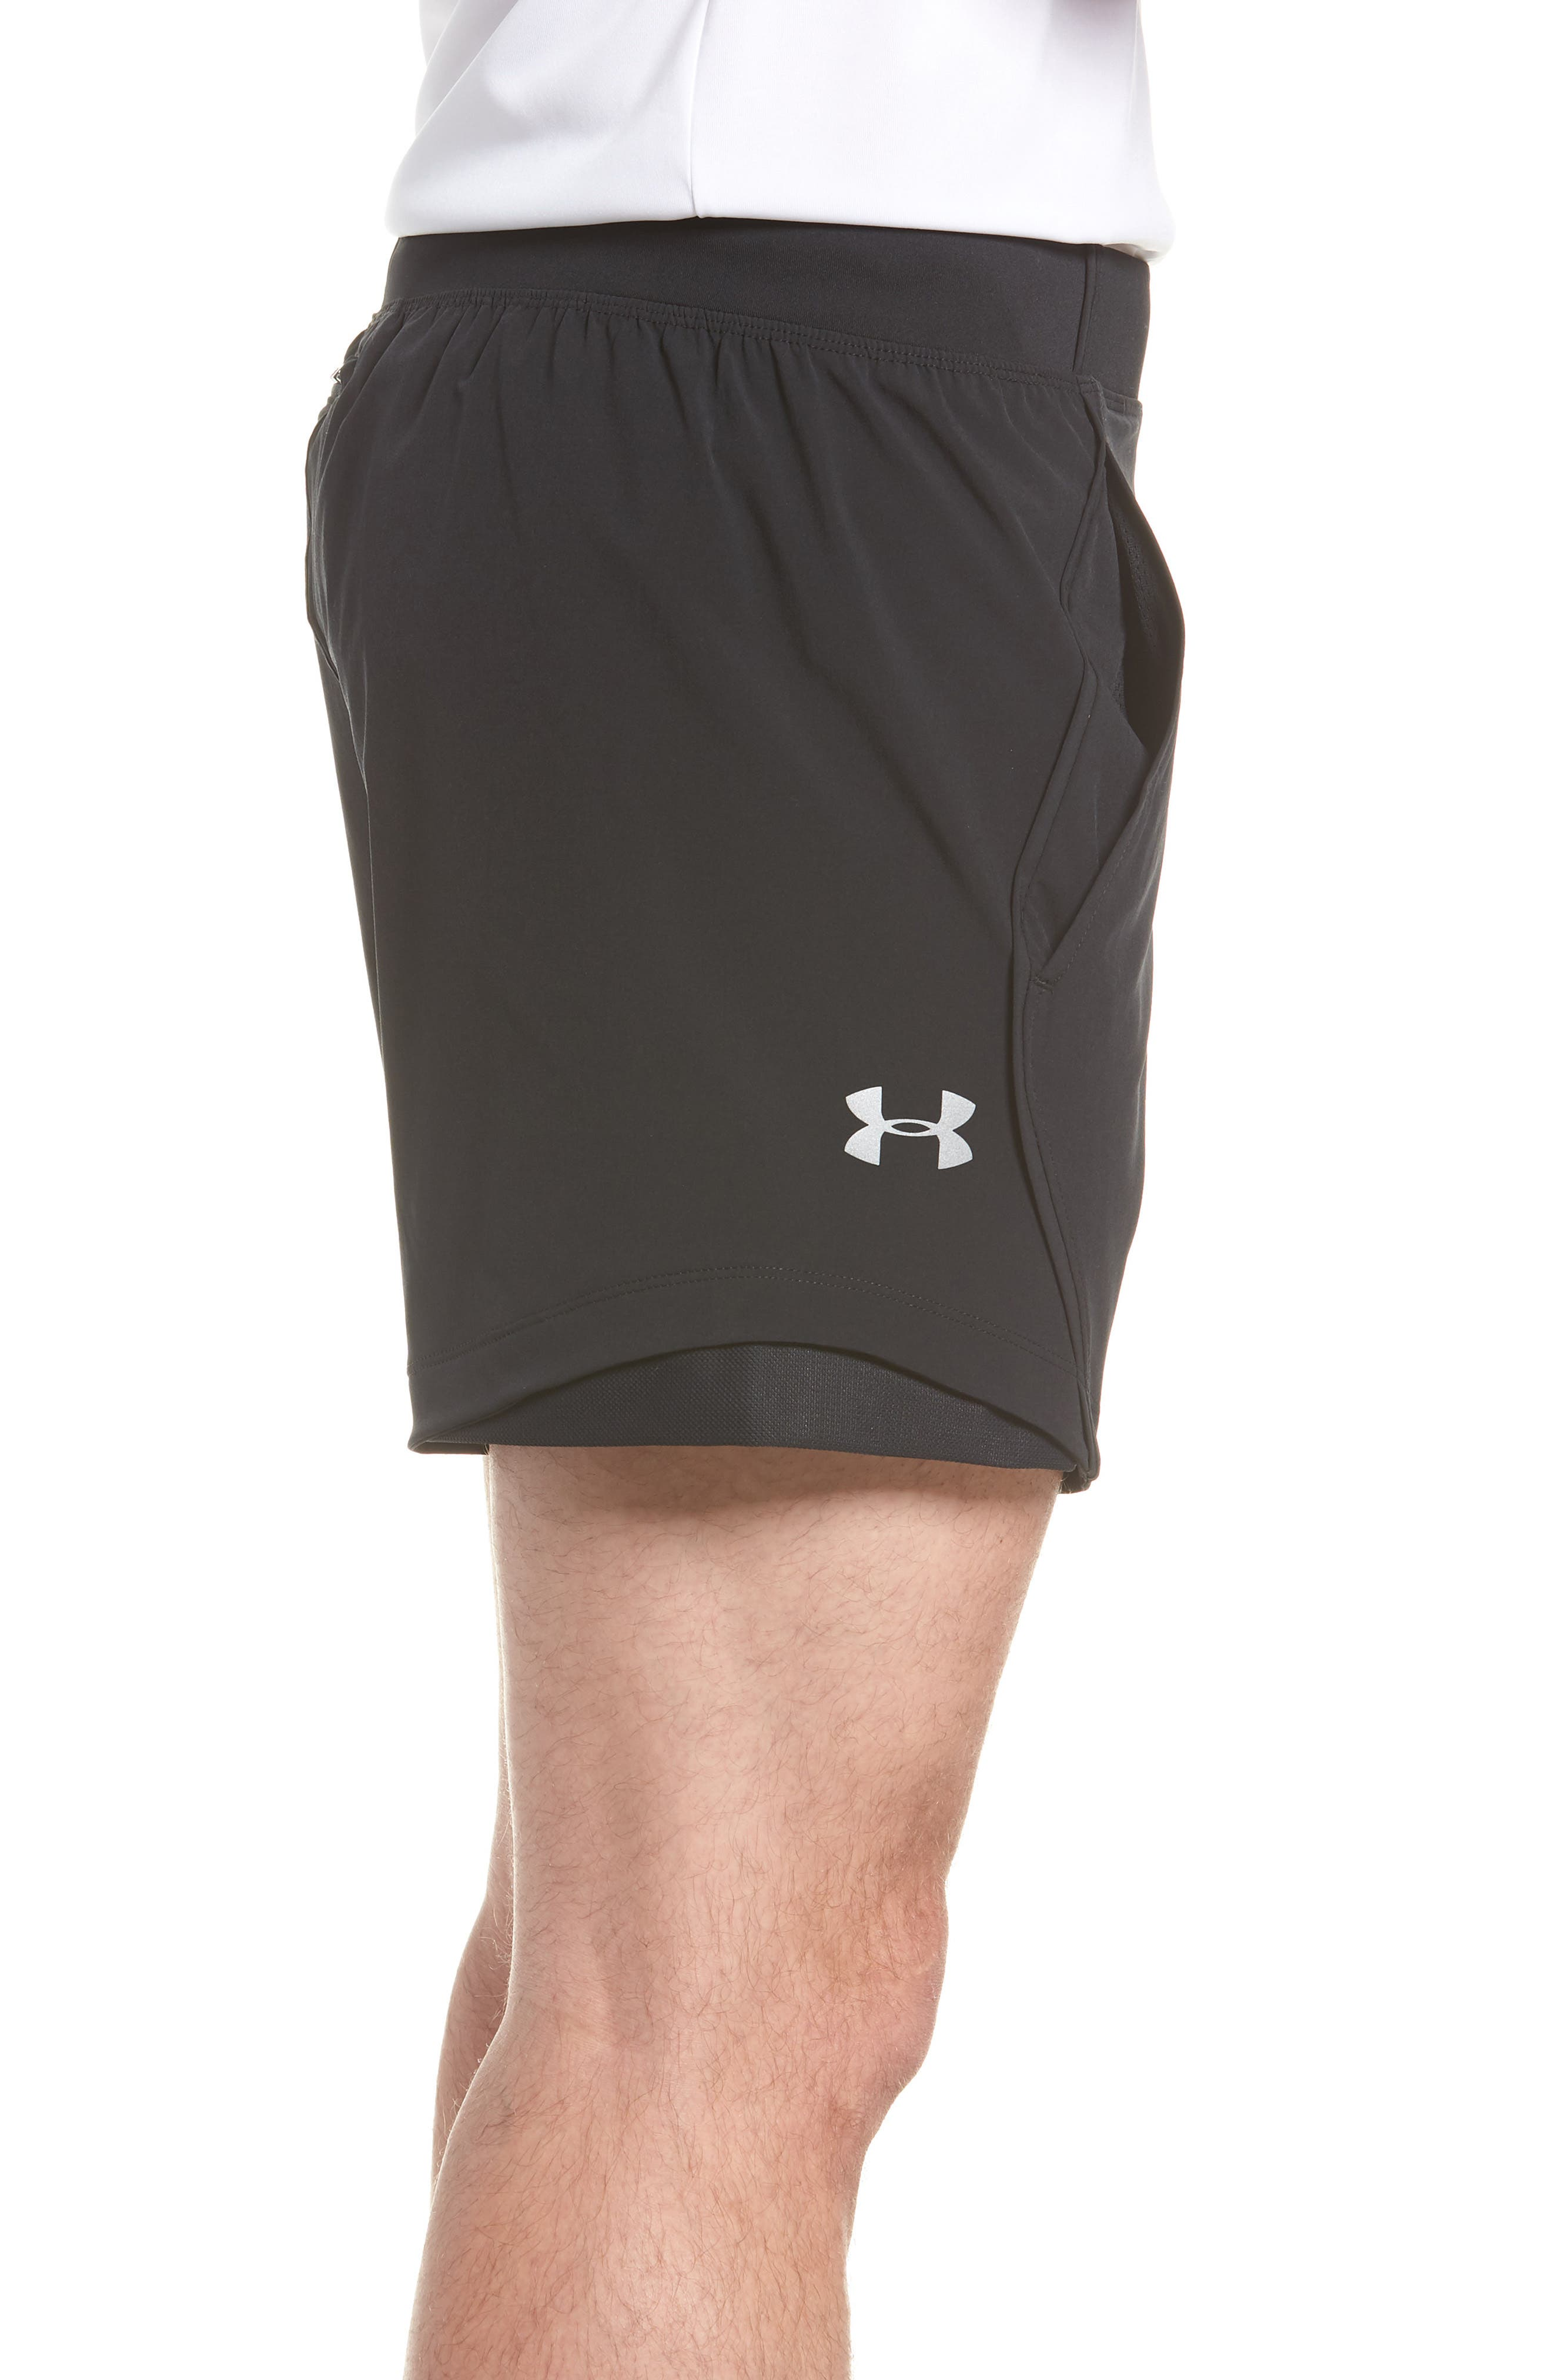 Under Armor Speedpocket Shorts,                             Alternate thumbnail 3, color,                             BLACK/ BLACK/ REFLECTIVE